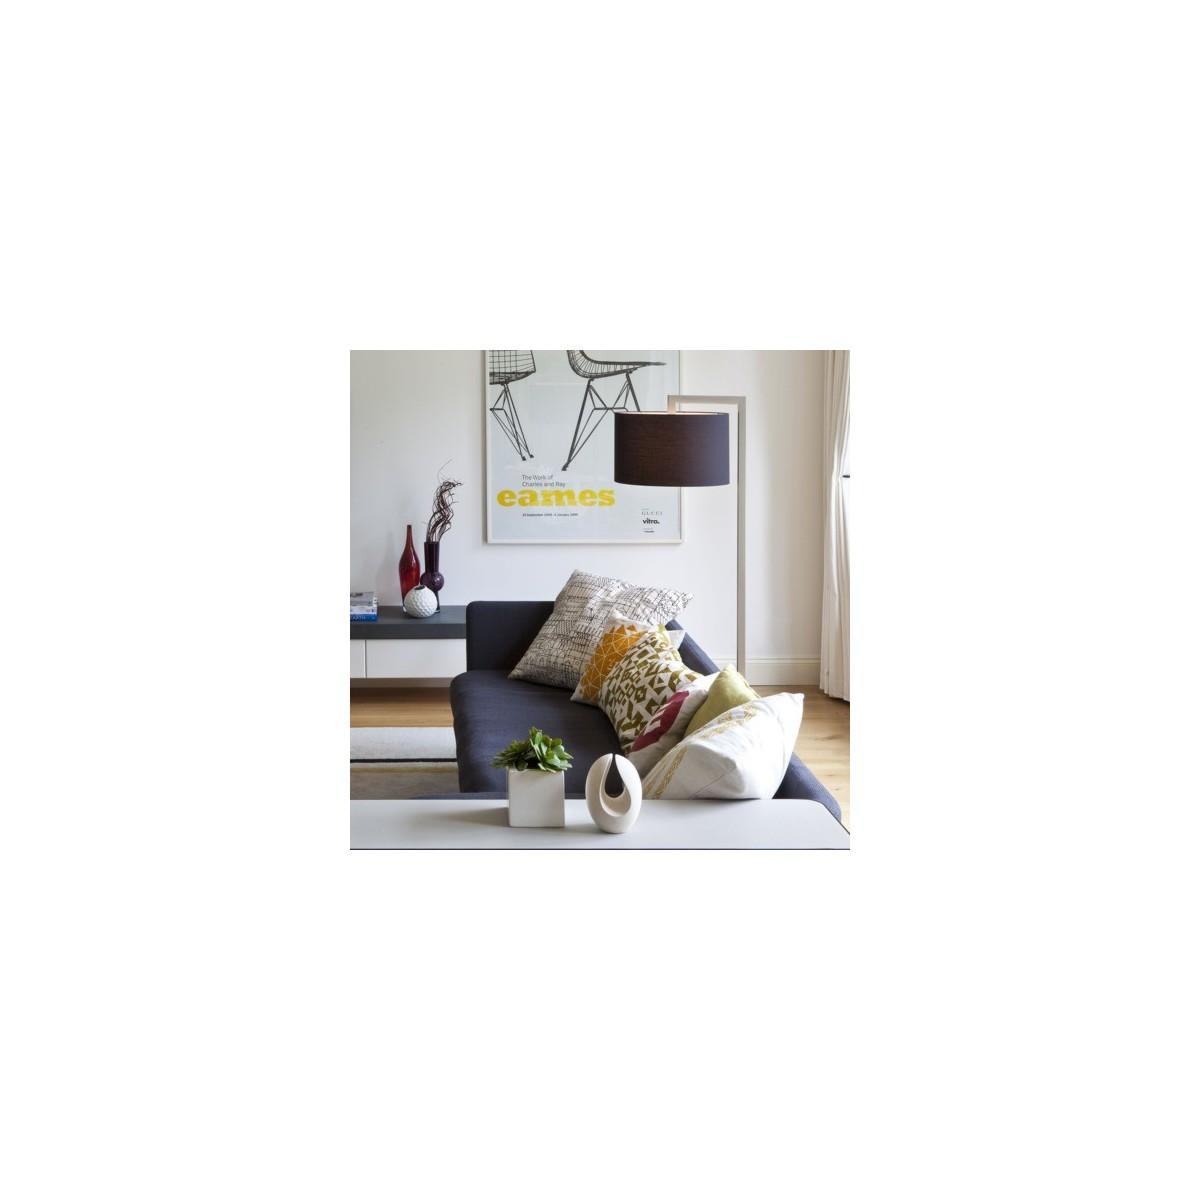 Astro Ravello Floor Podłogowa 1x60W Max E27 Matowy Nikiel 1222002